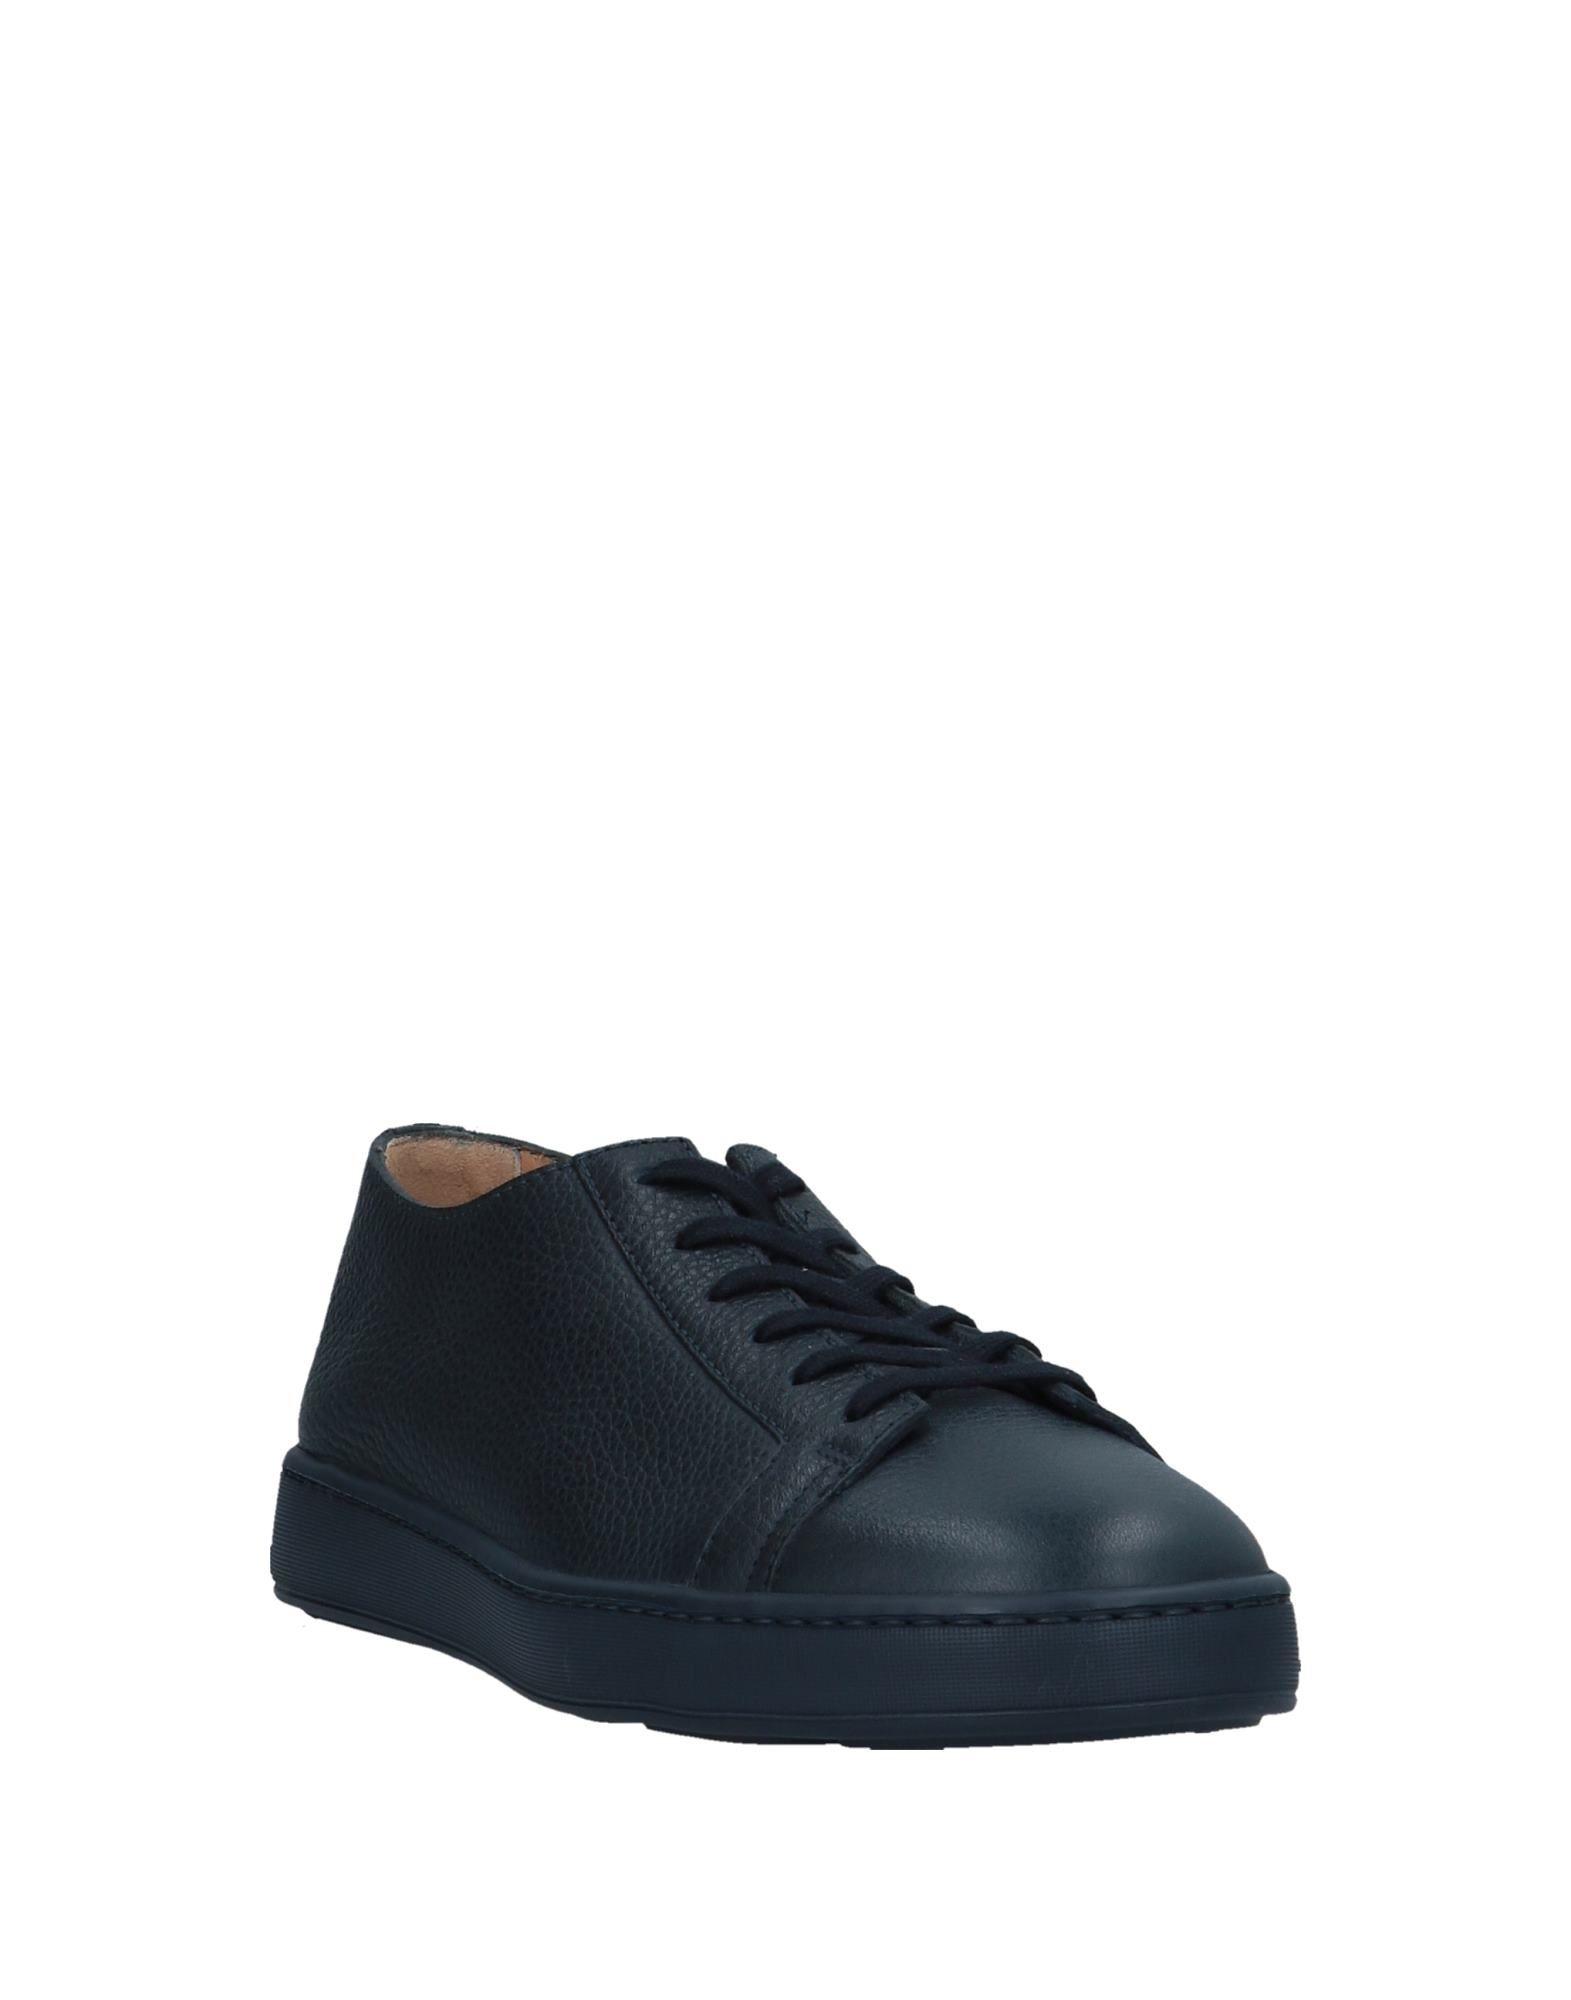 Santoni Gute Sneakers Herren  11542249ND Gute Santoni Qualität beliebte Schuhe e45ca6